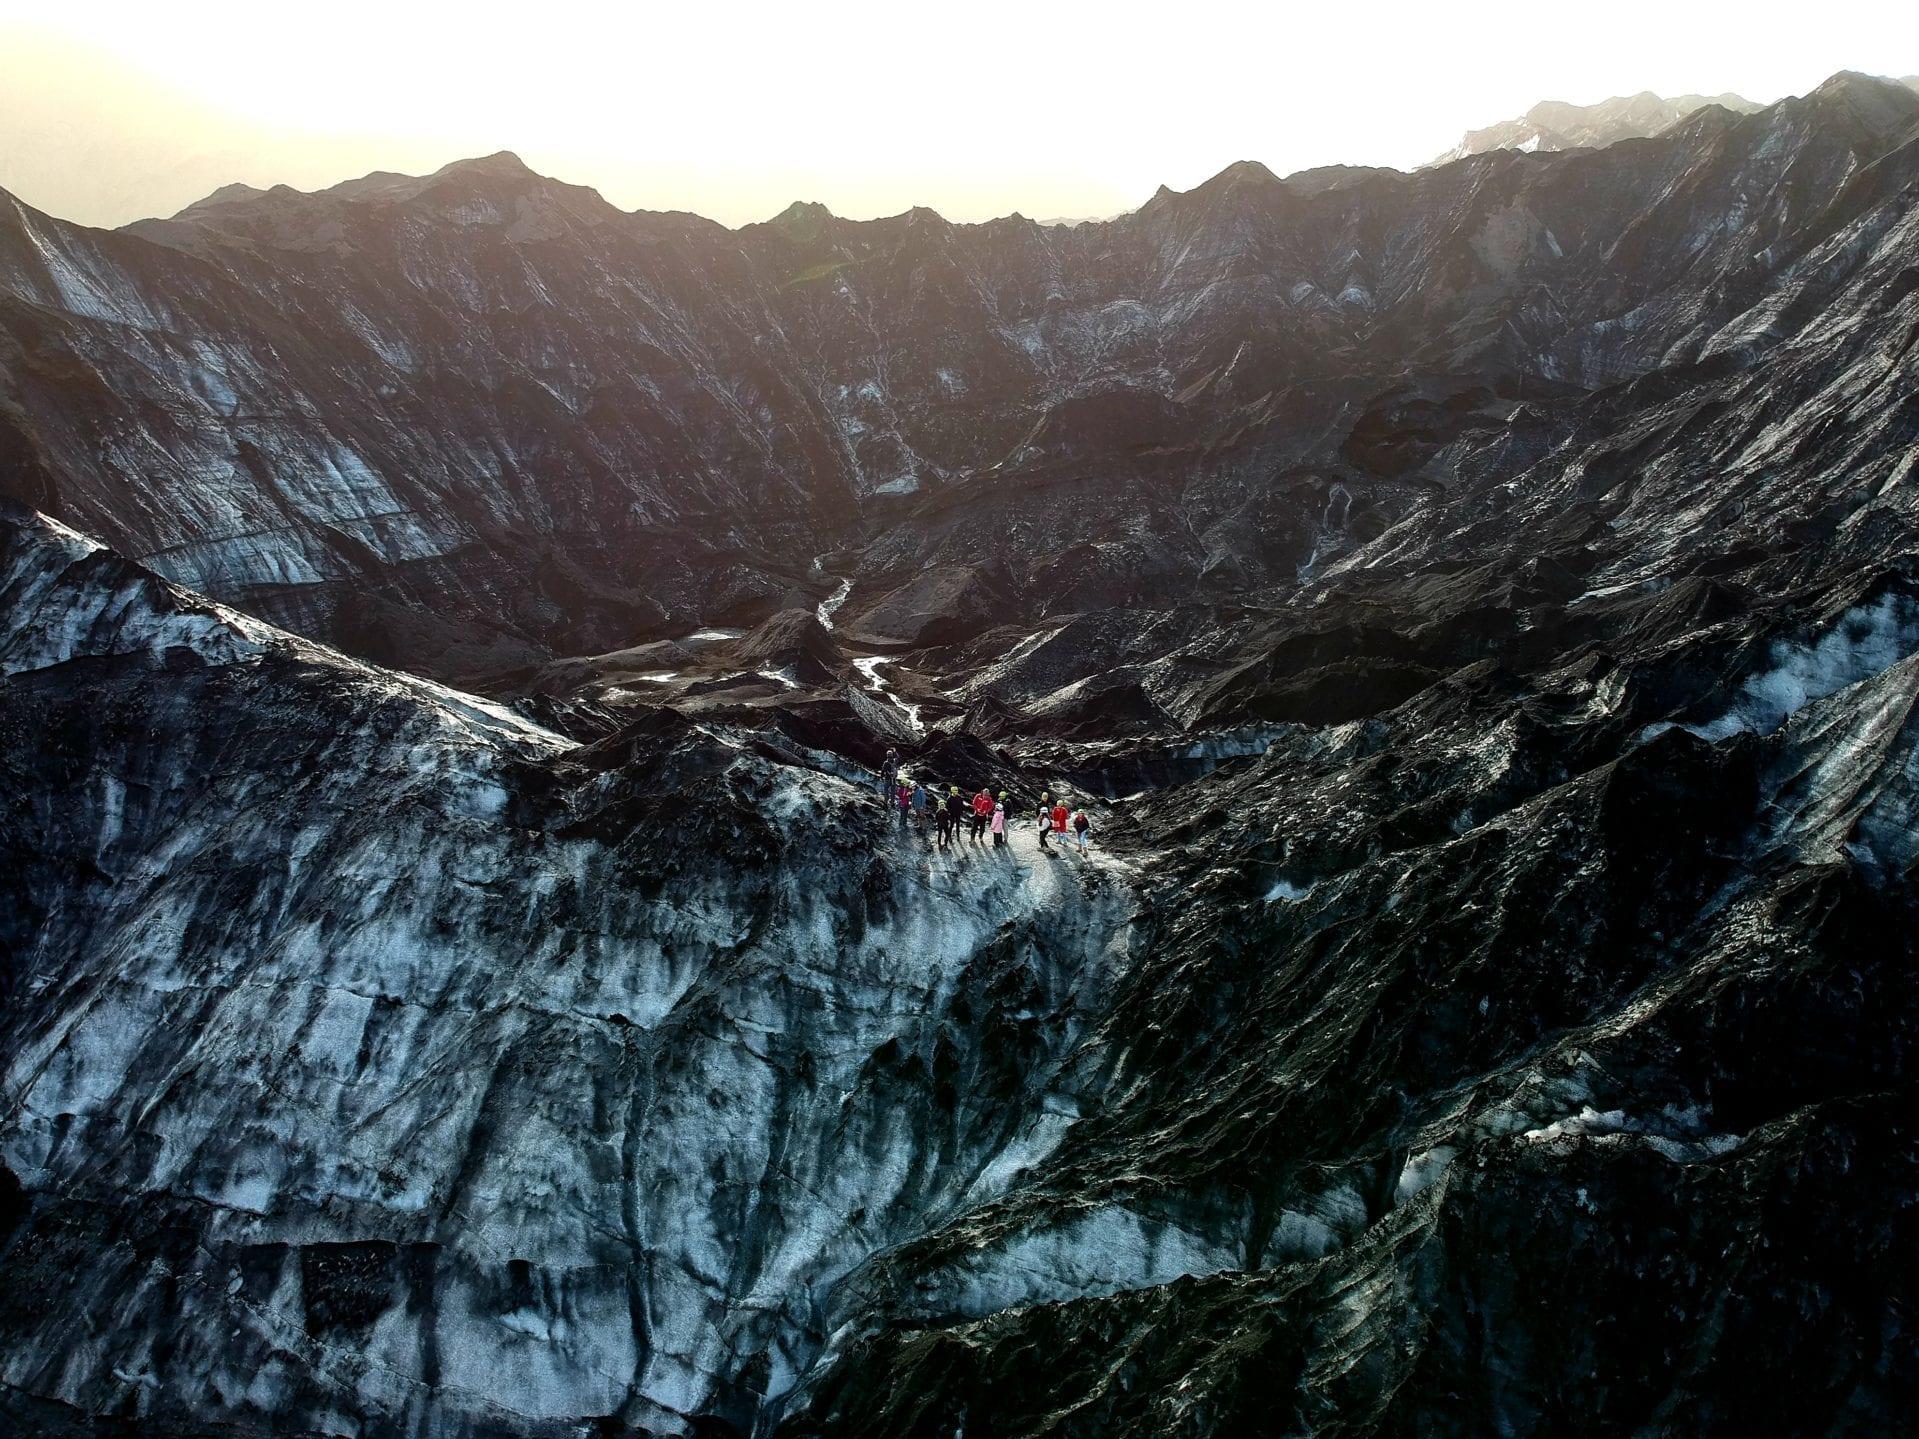 katla-ice-cave-dragon-glass